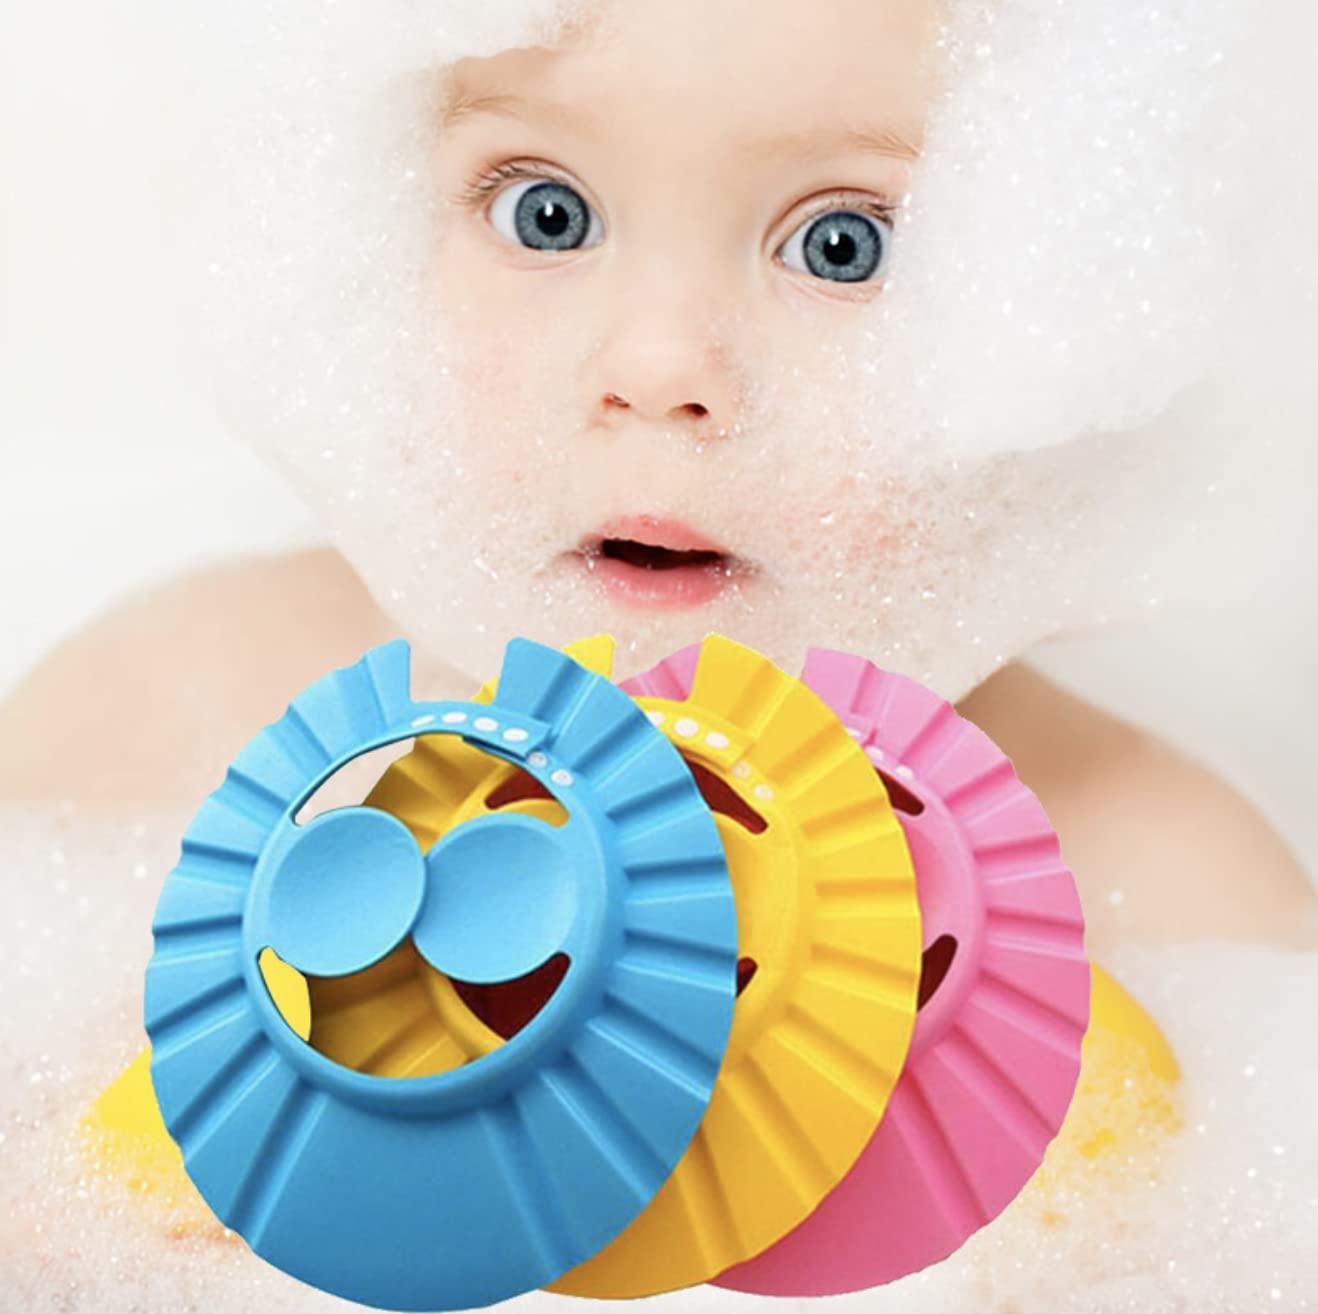 Baby Shower Cap for Washing Hair| Baby Hair Washing Guard Bathing Shampoo Shower Visor Protection Hat, Adjustable Toddler Shower Cap Hair Washing hat for Toddlers Children, Baby, Kids .(3 Pcs)